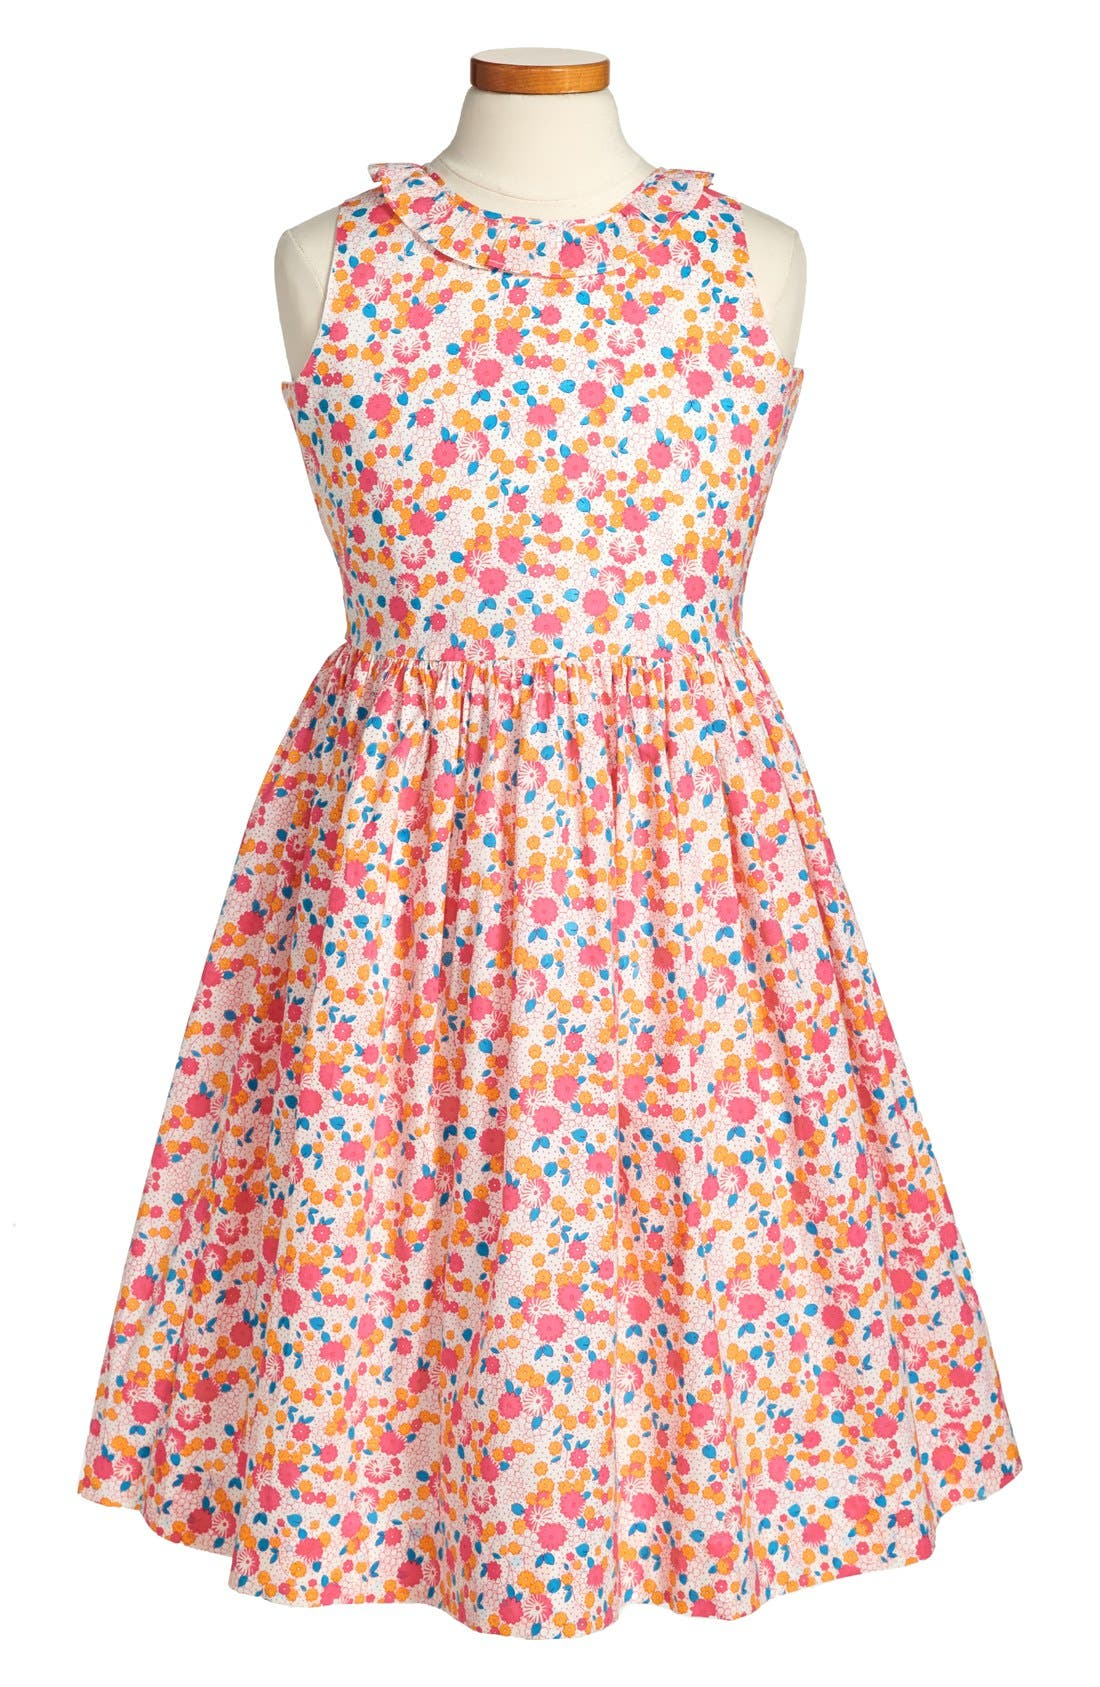 Main Image - Oscar de la Renta Ruffle Collar Dress (Toddler Girls, Little Girls & Big Girls)